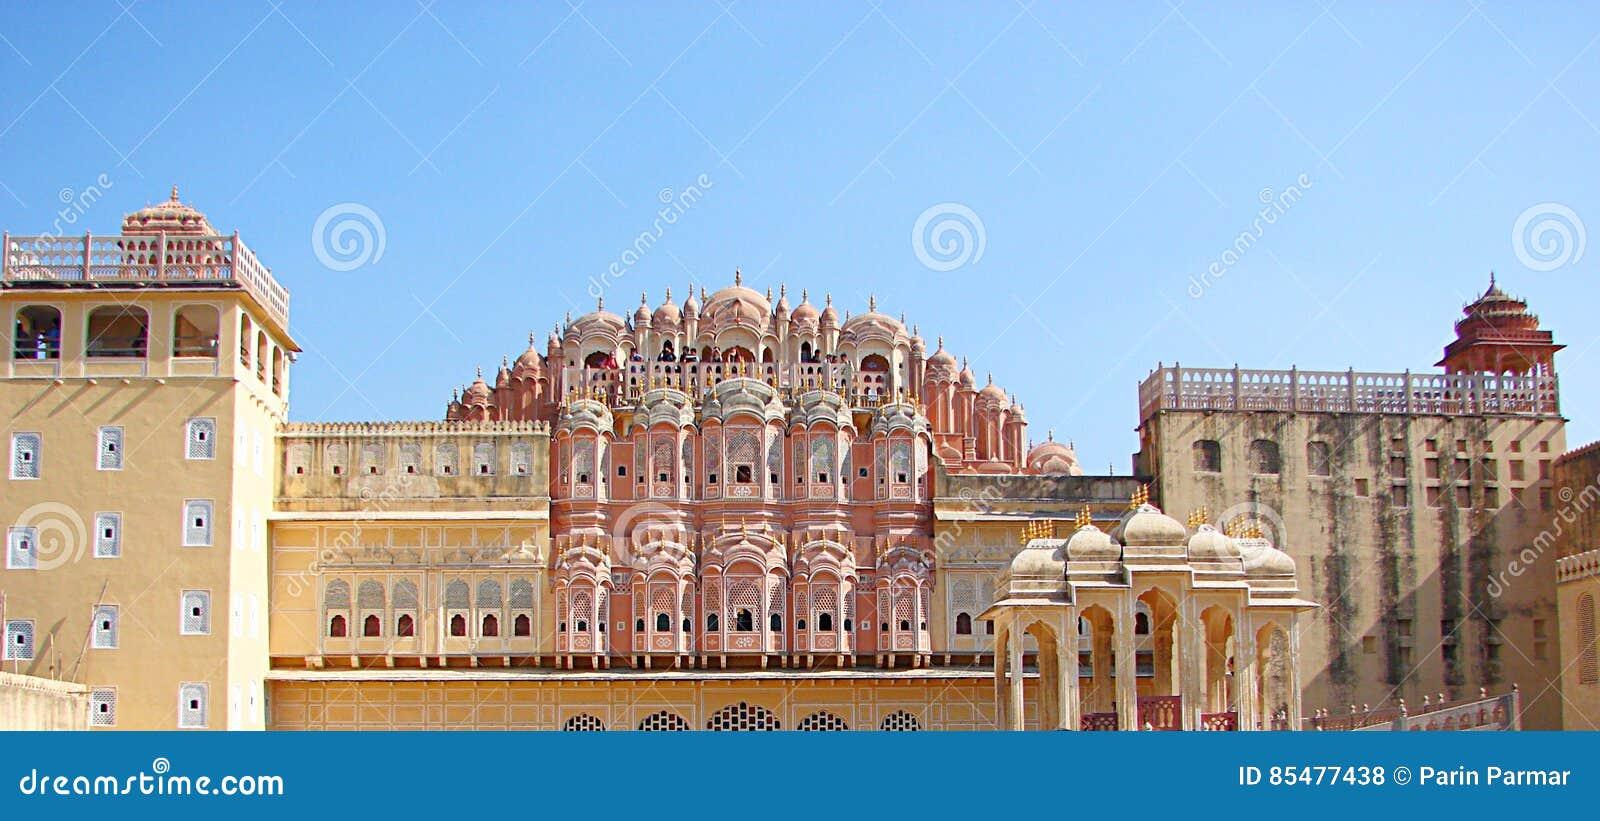 Achtermening van Hawa Mahal Palace, Jaipur, Rajasthan, India